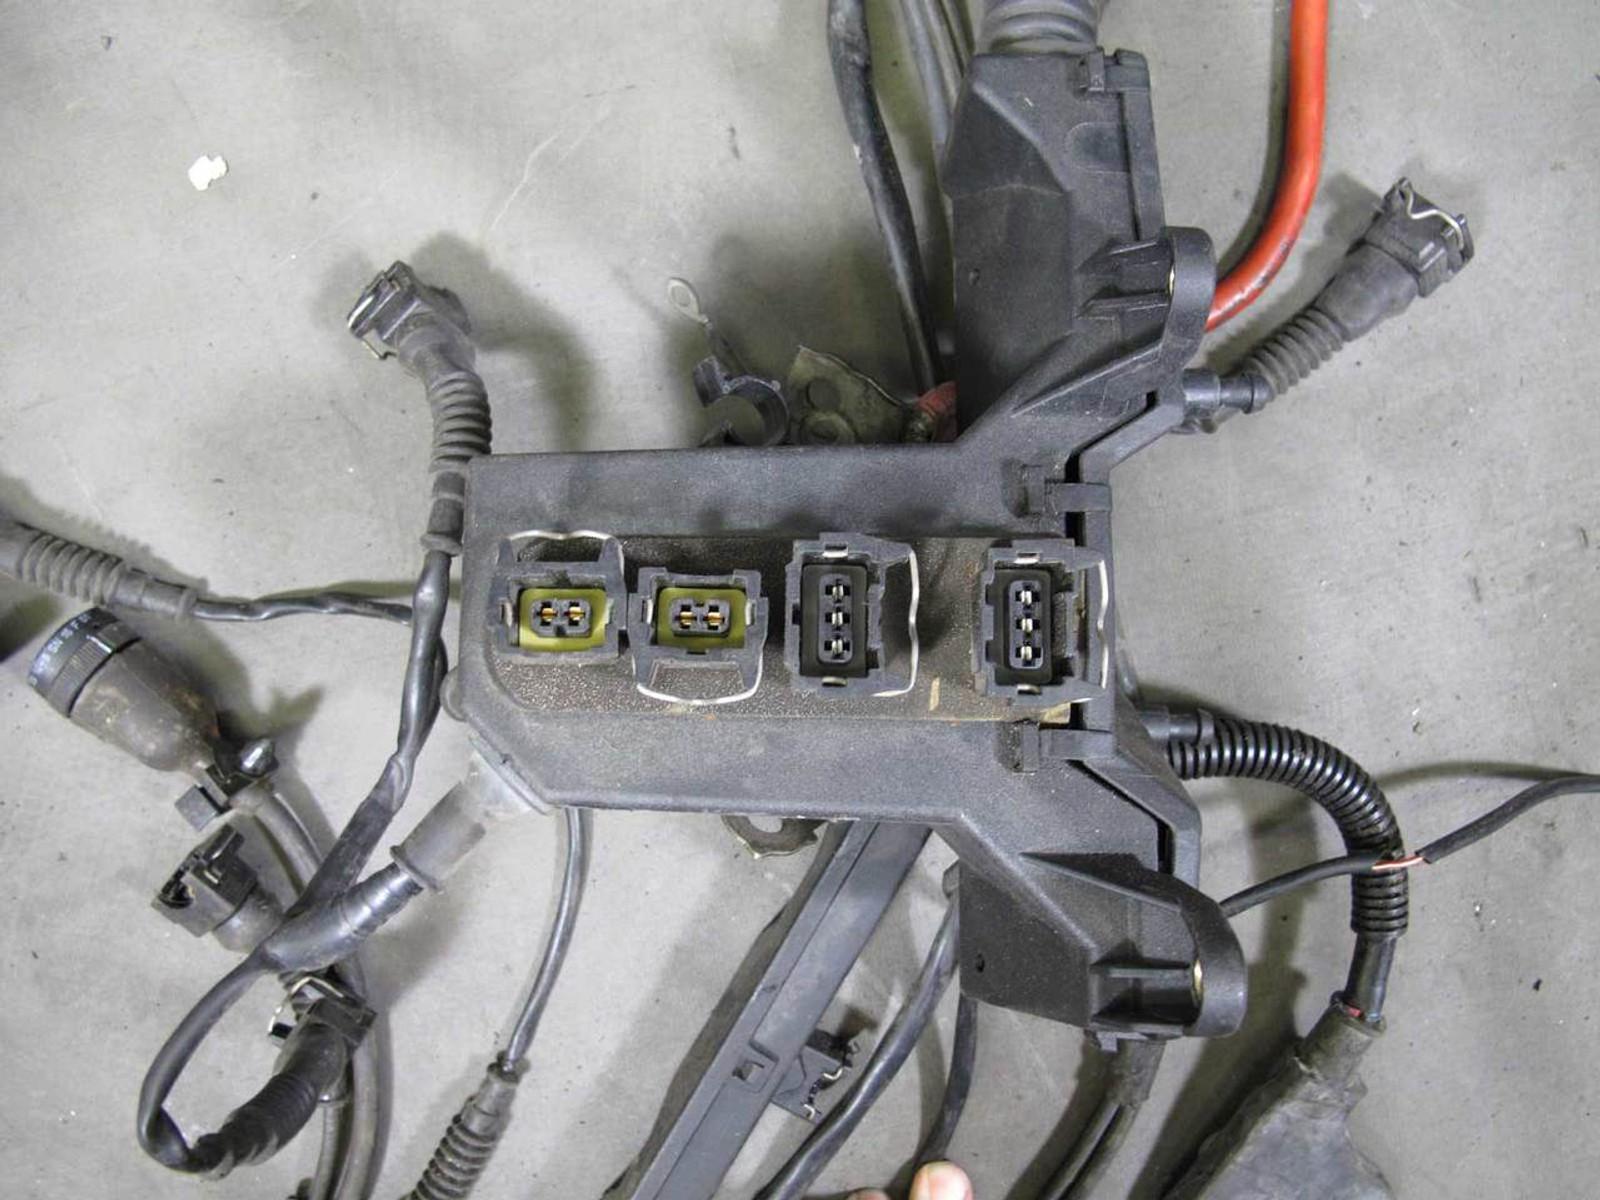 1995 bmw wiring harness electrical wiring diagrams 1988 dodge dakota power steering 1988 dodge dakota engine [ 1600 x 1200 Pixel ]